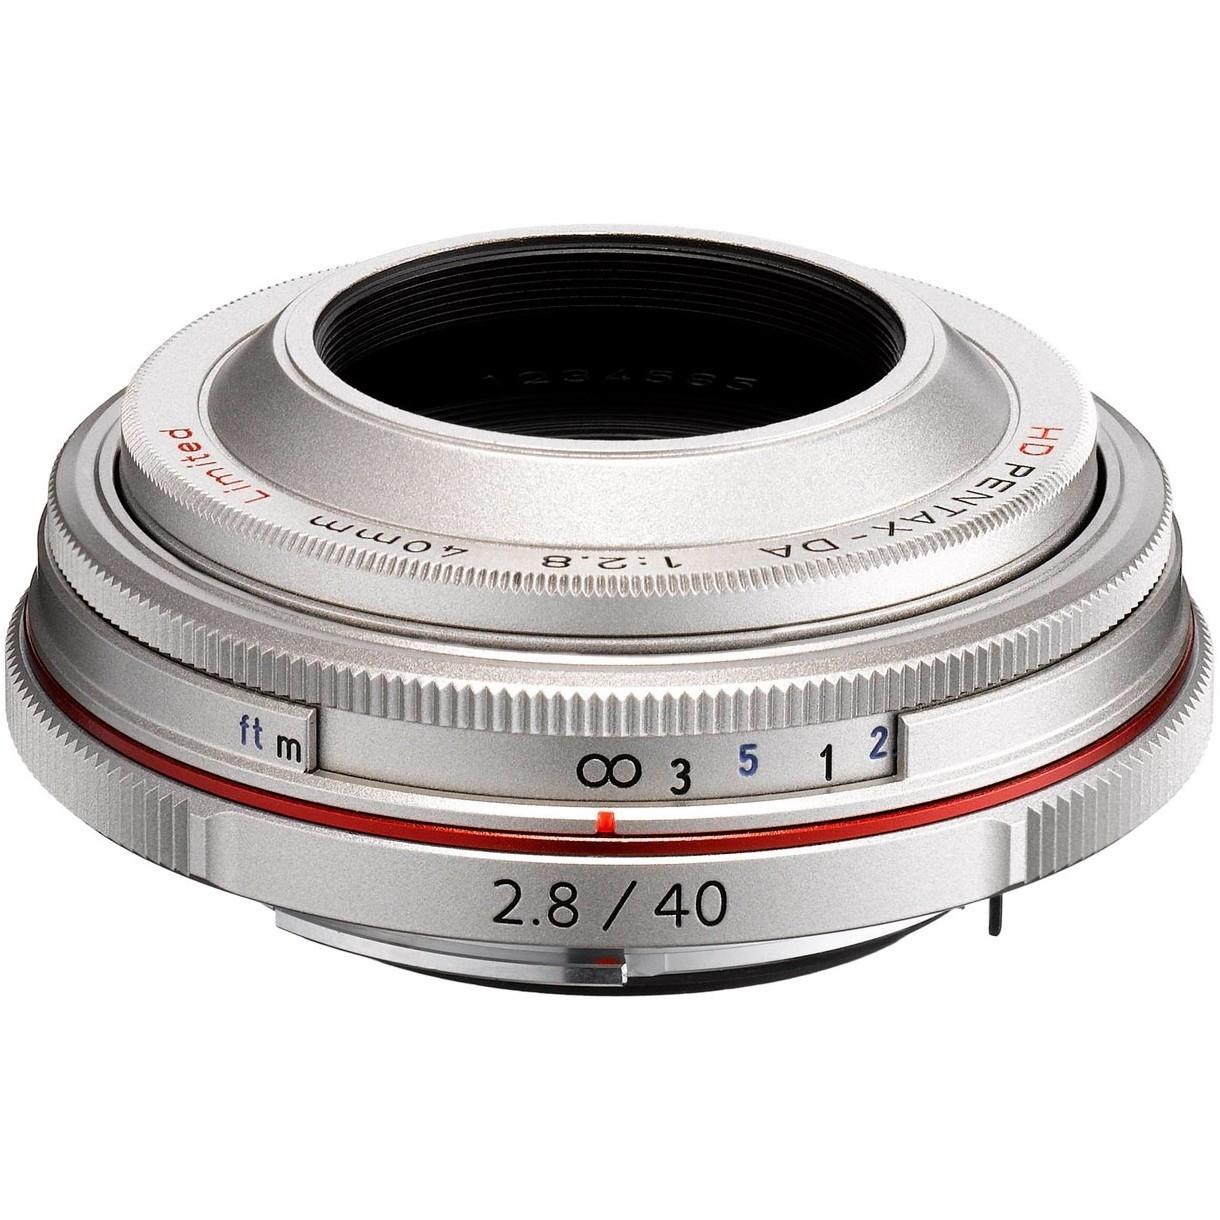 Объектив Pentax HD DA 40mm f/2.8 Limited